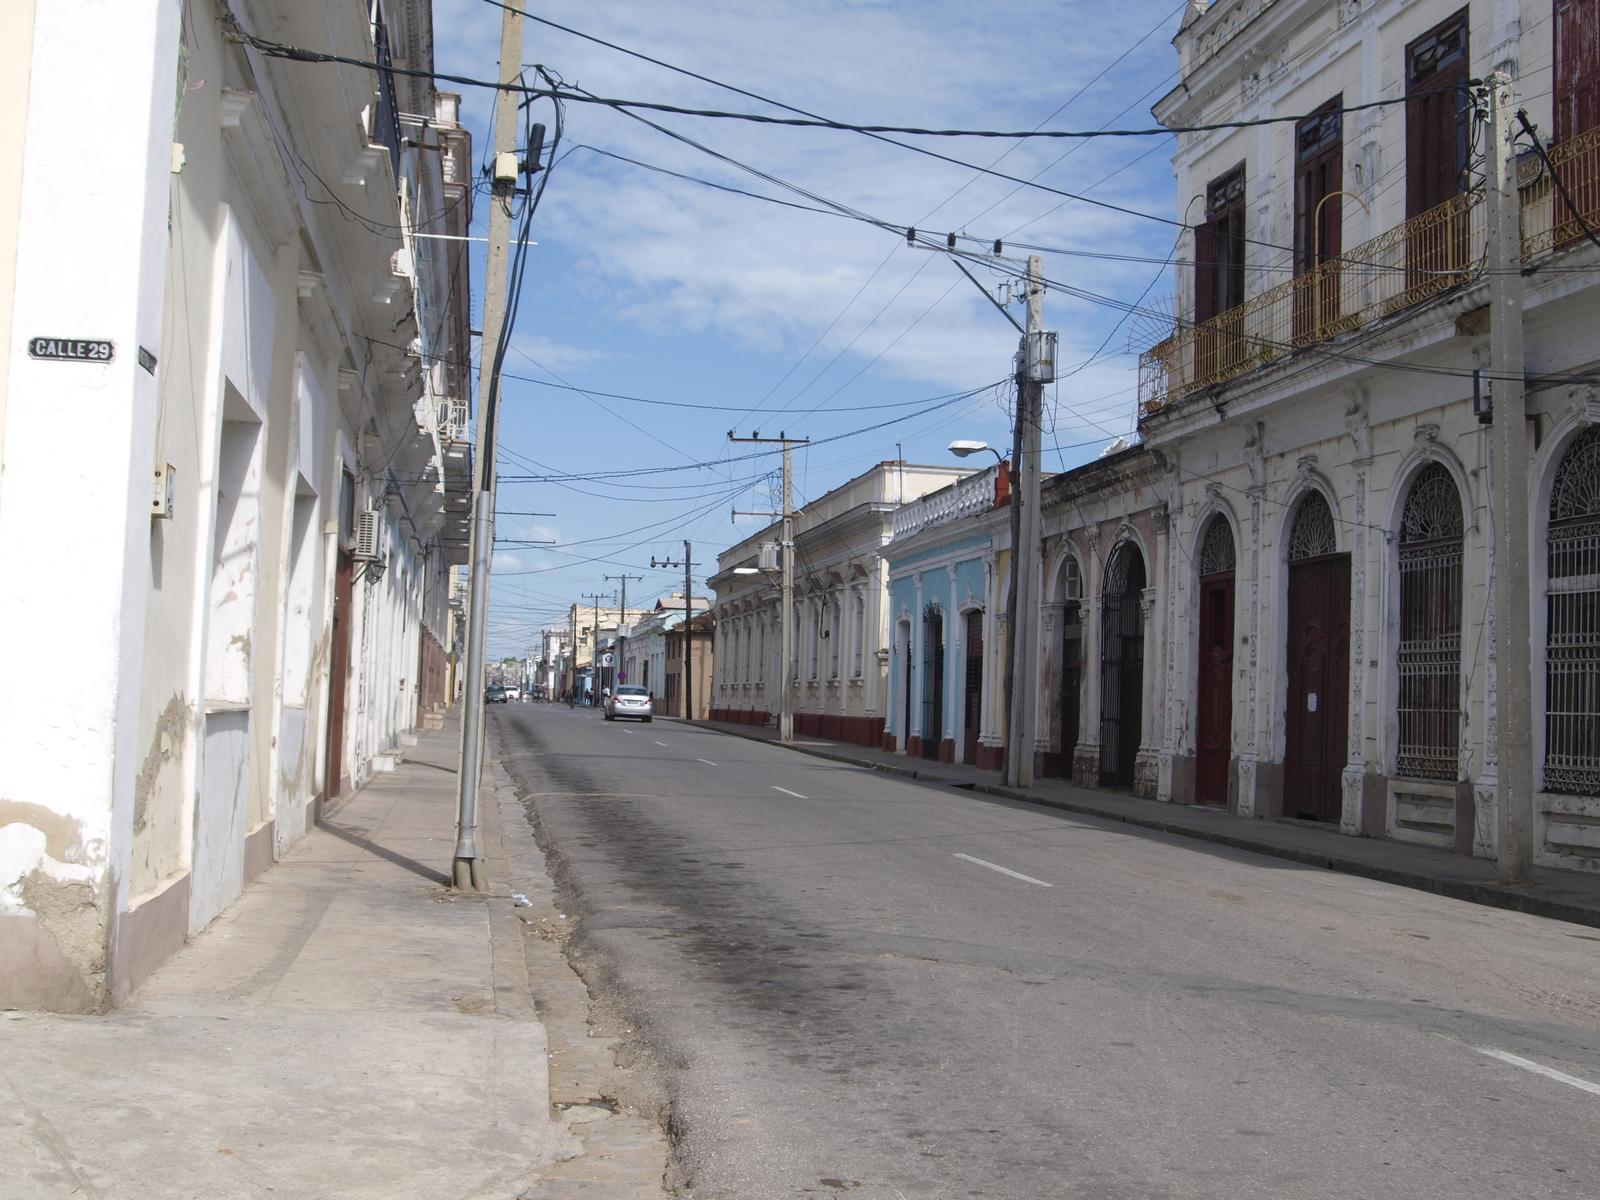 Kuba architektúra - Casilda